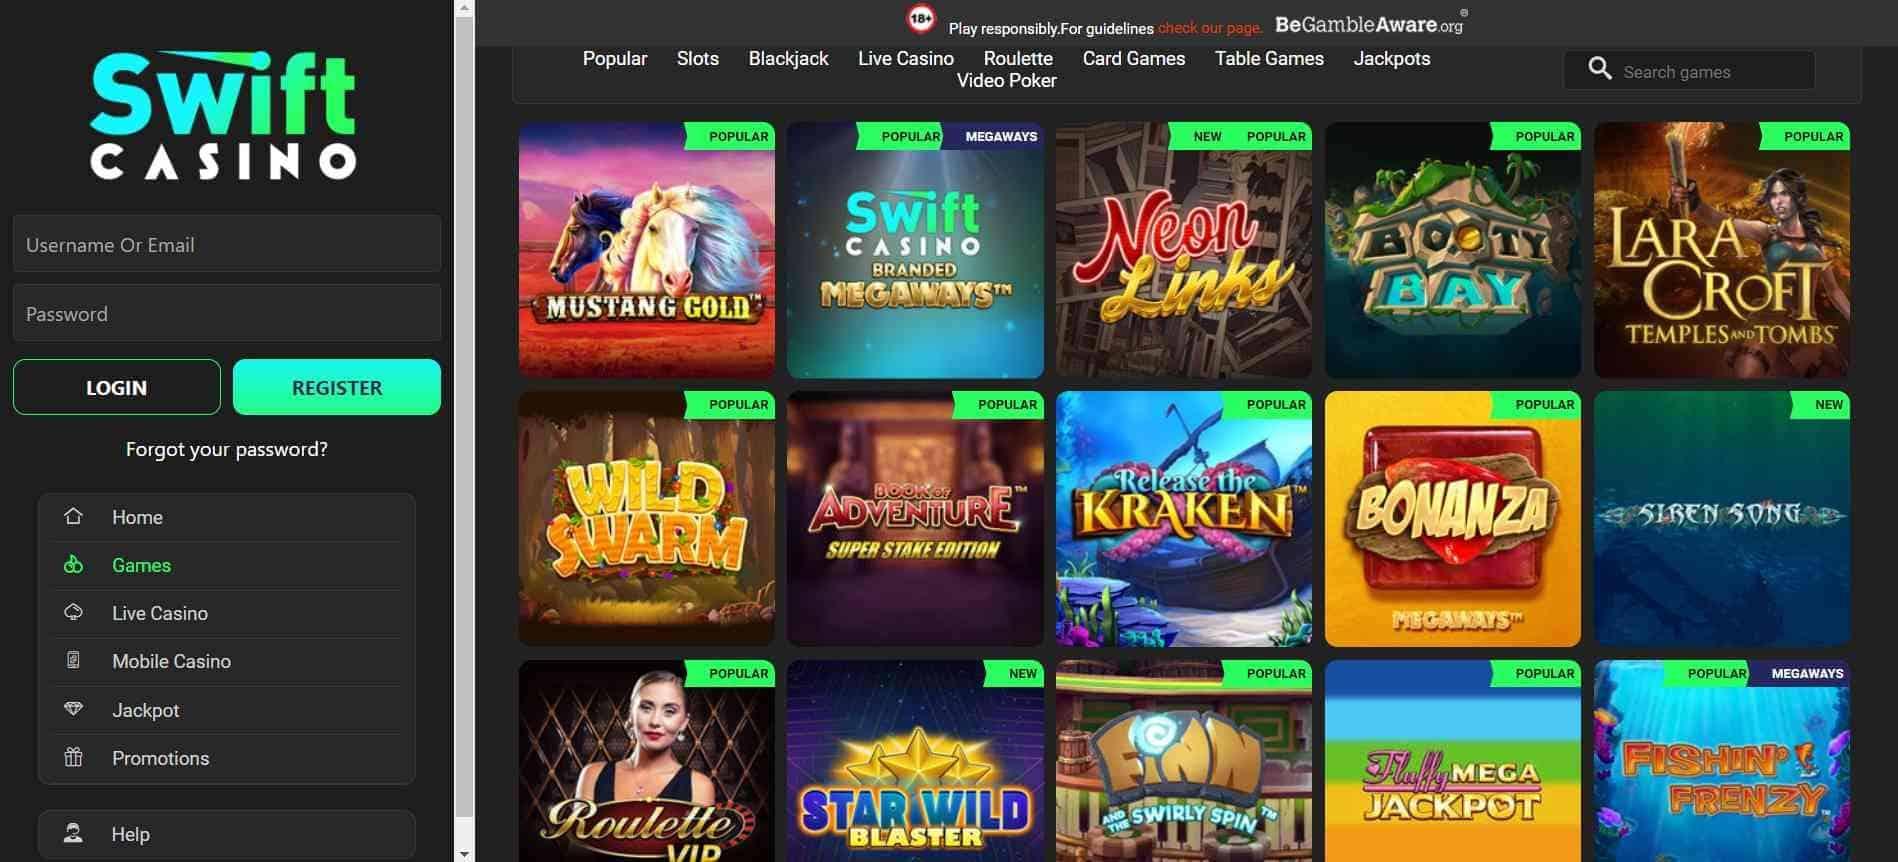 Swift Casino Slot Selection